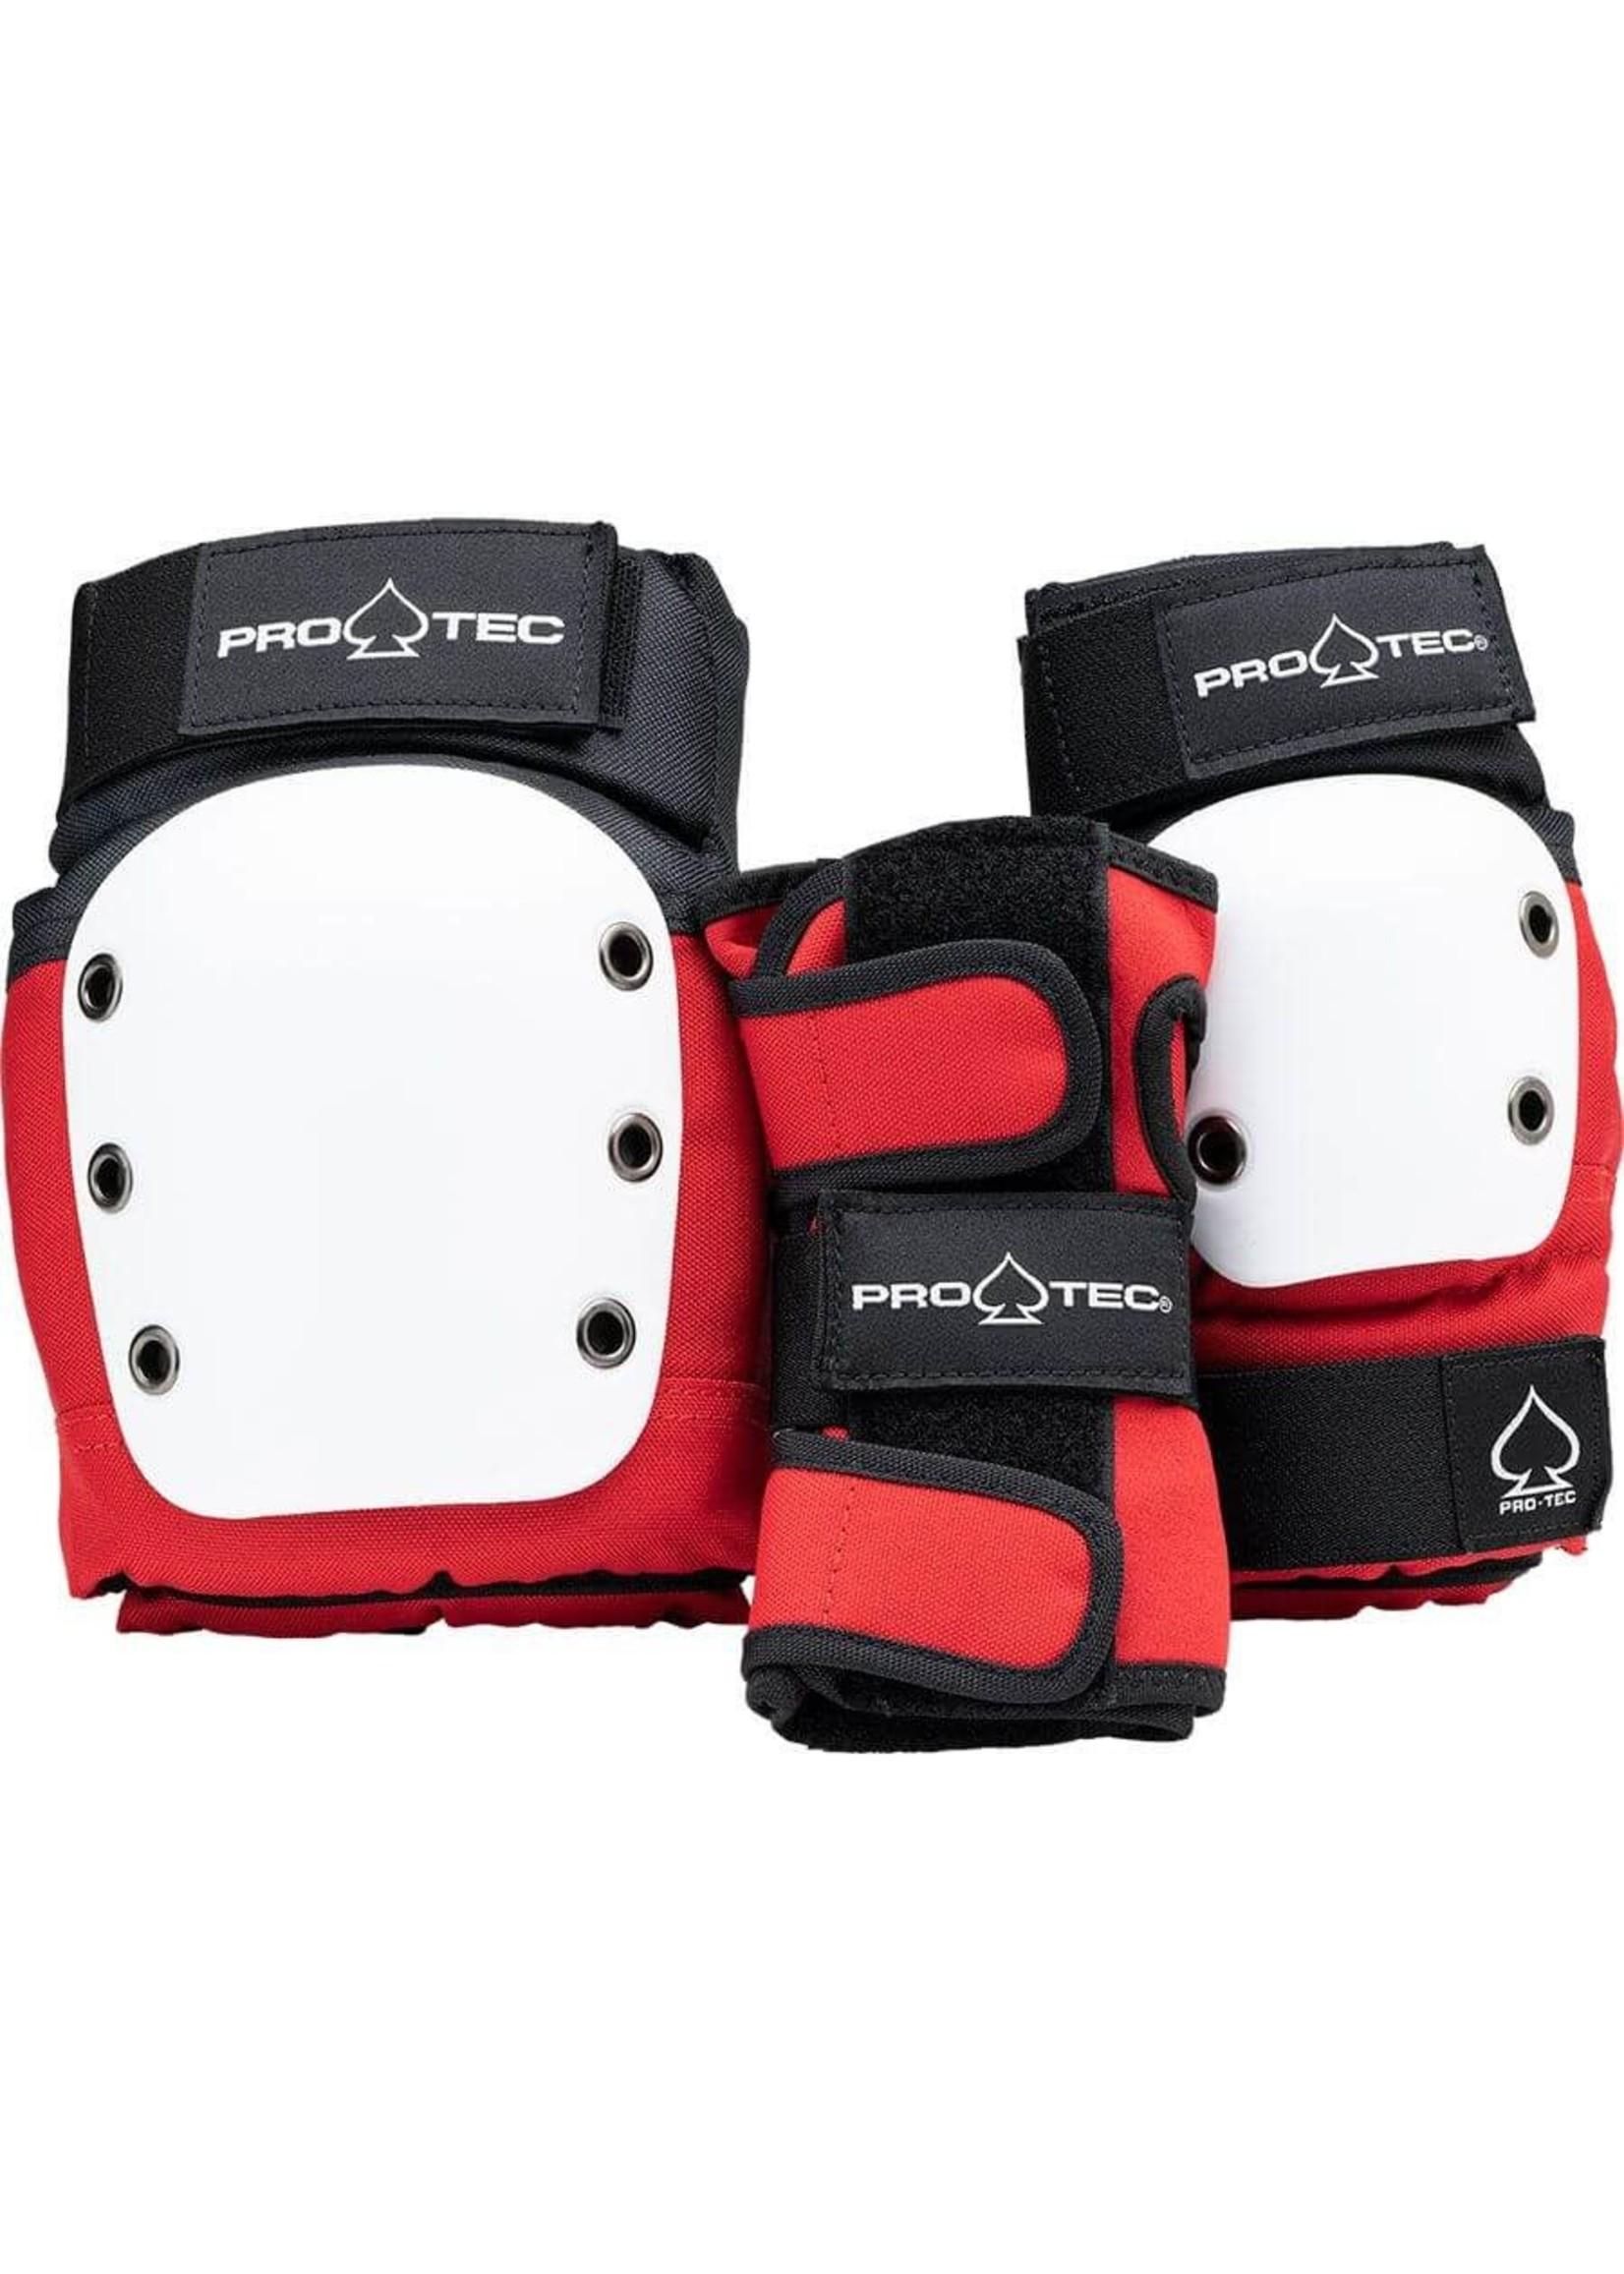 Protec Protec - Junior 3 Pack Pad Set